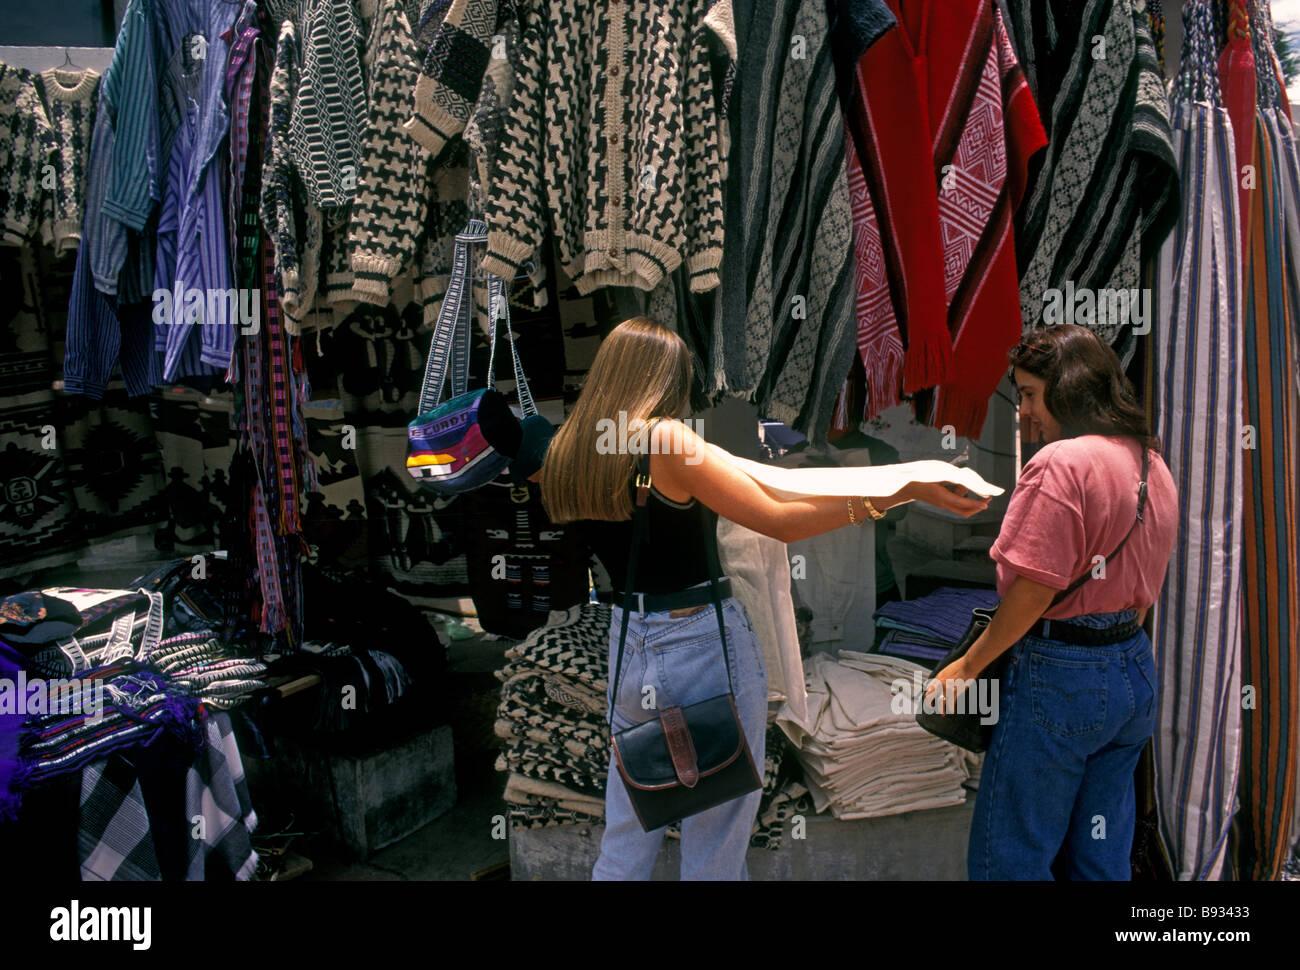 Ecuadoran women, vendor, shopping, Otavalo Market, Indian market, Plaza de Ponchos, town of Otavalo, Imbabura Province, - Stock Image